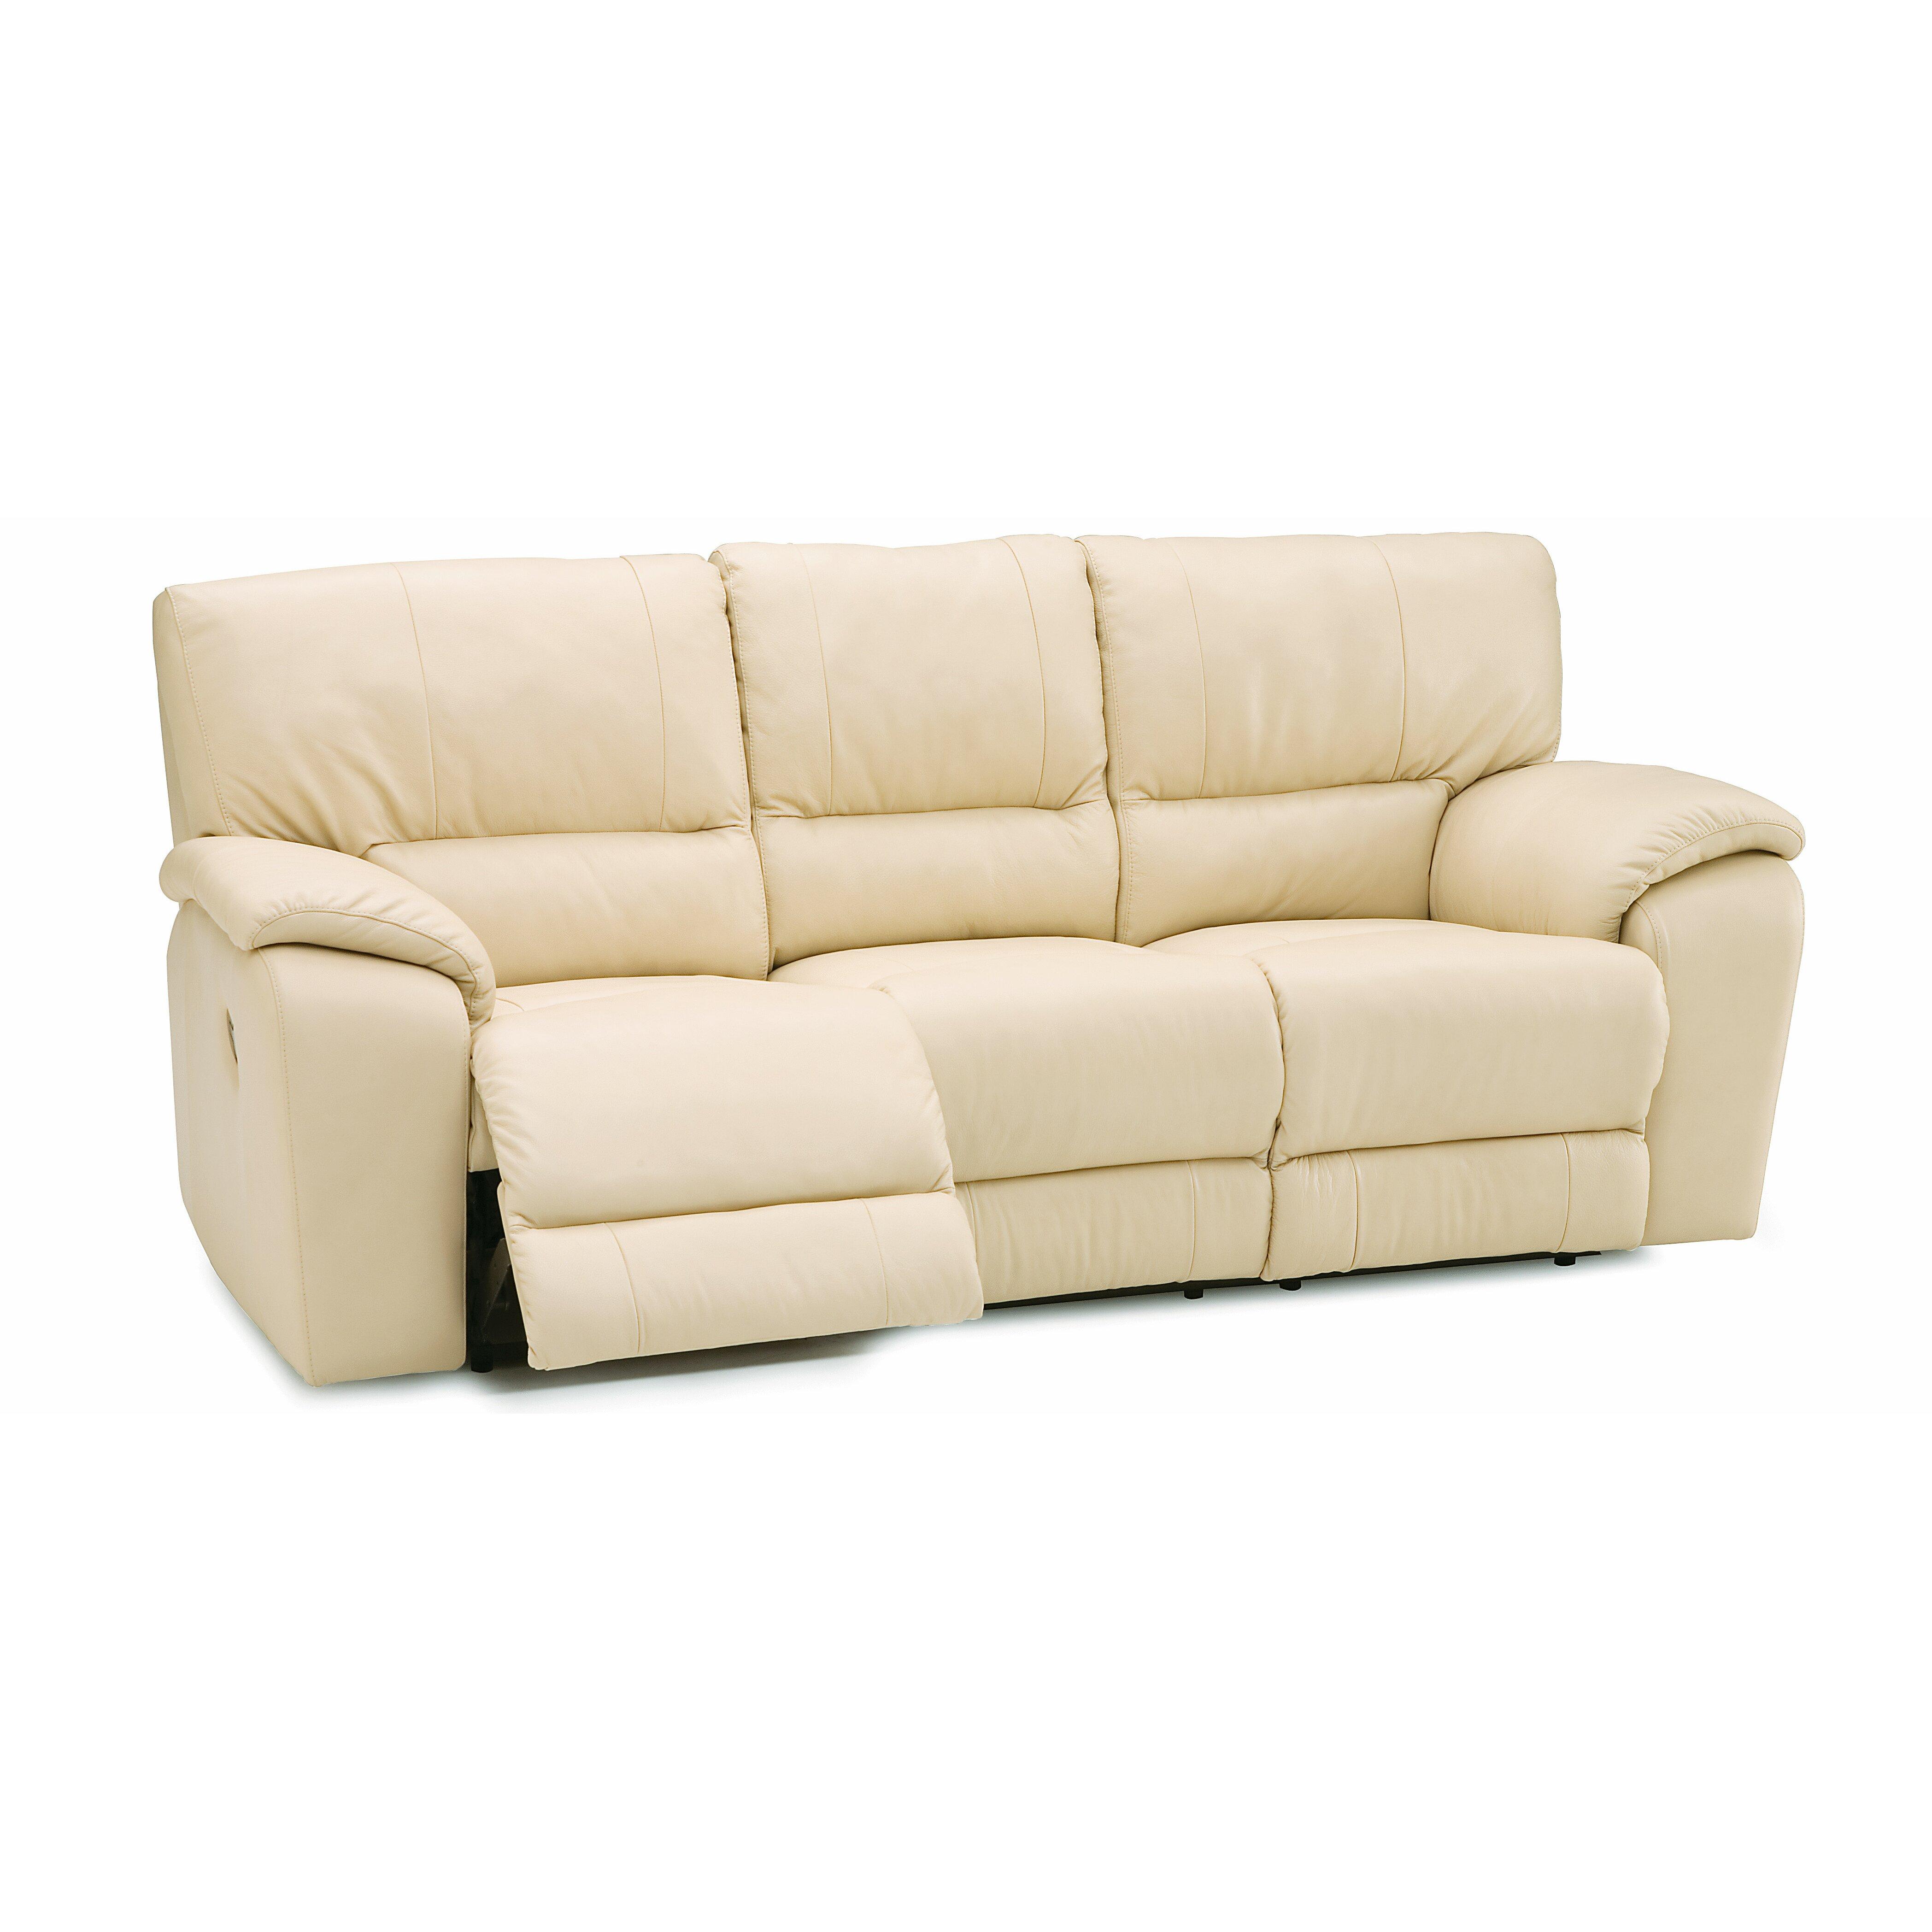 Motorized Recliner Sofa Reviews